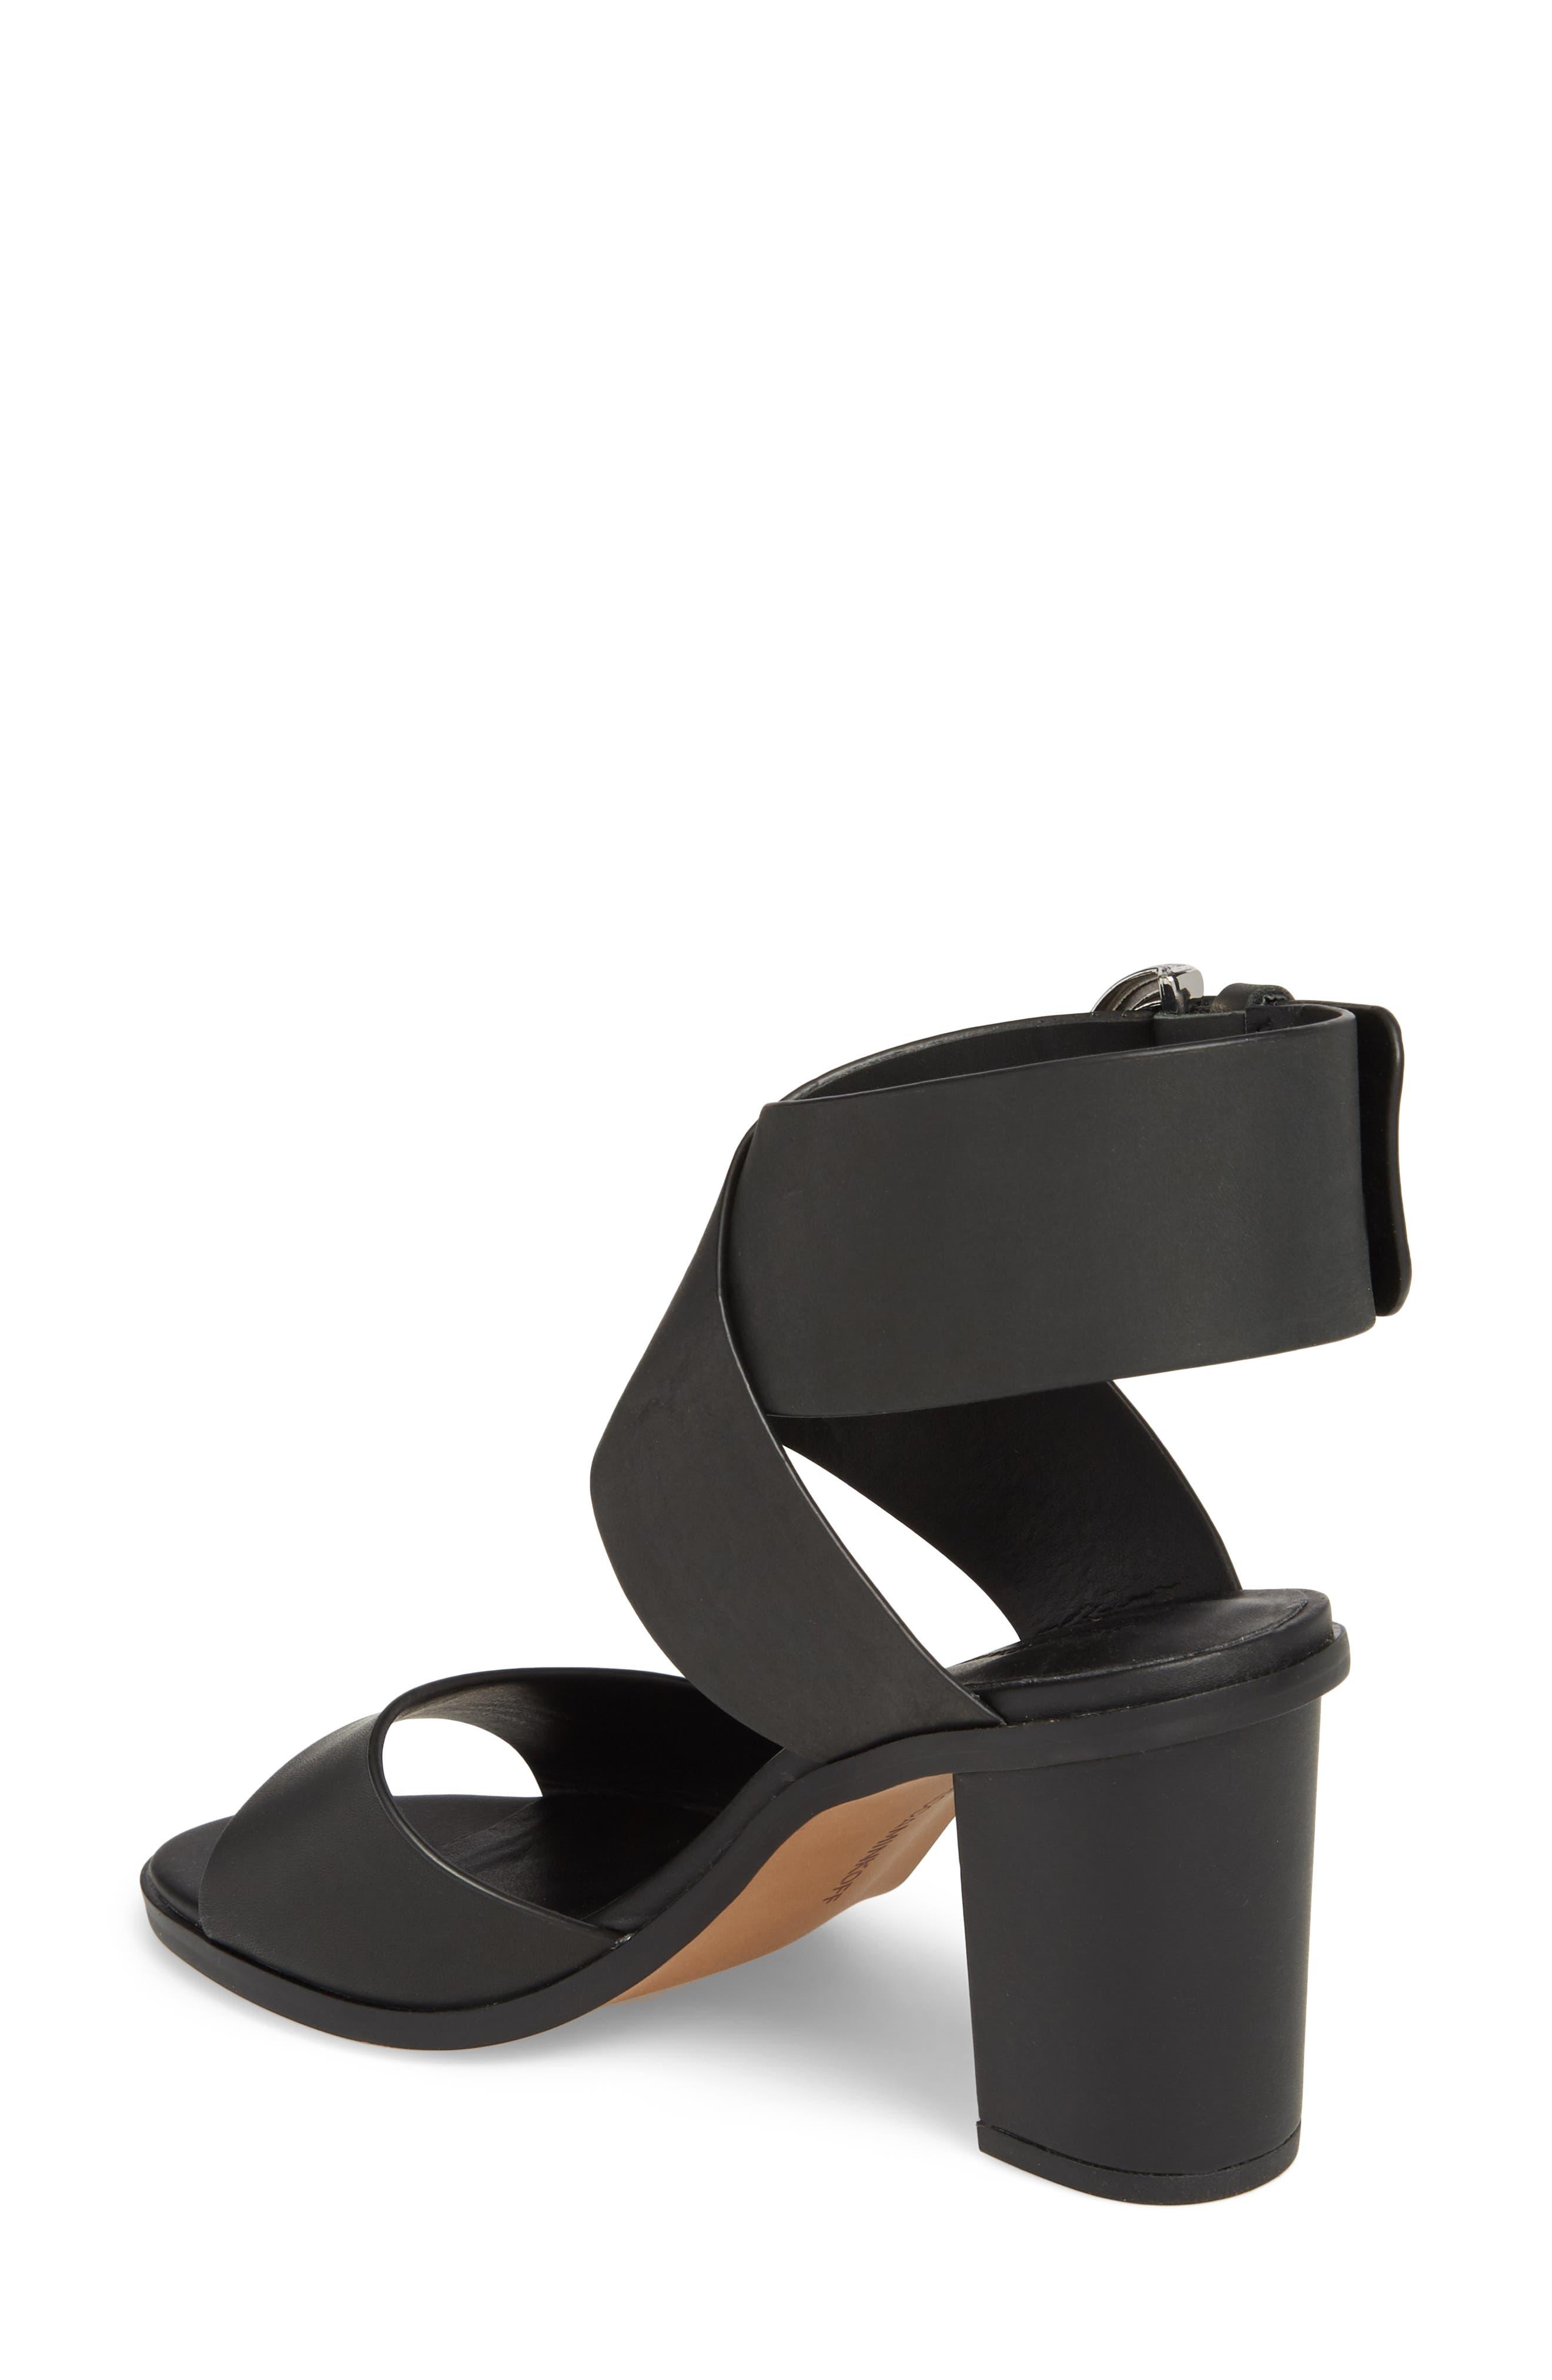 Valaree Sandal,                             Alternate thumbnail 2, color,                             Black Leather